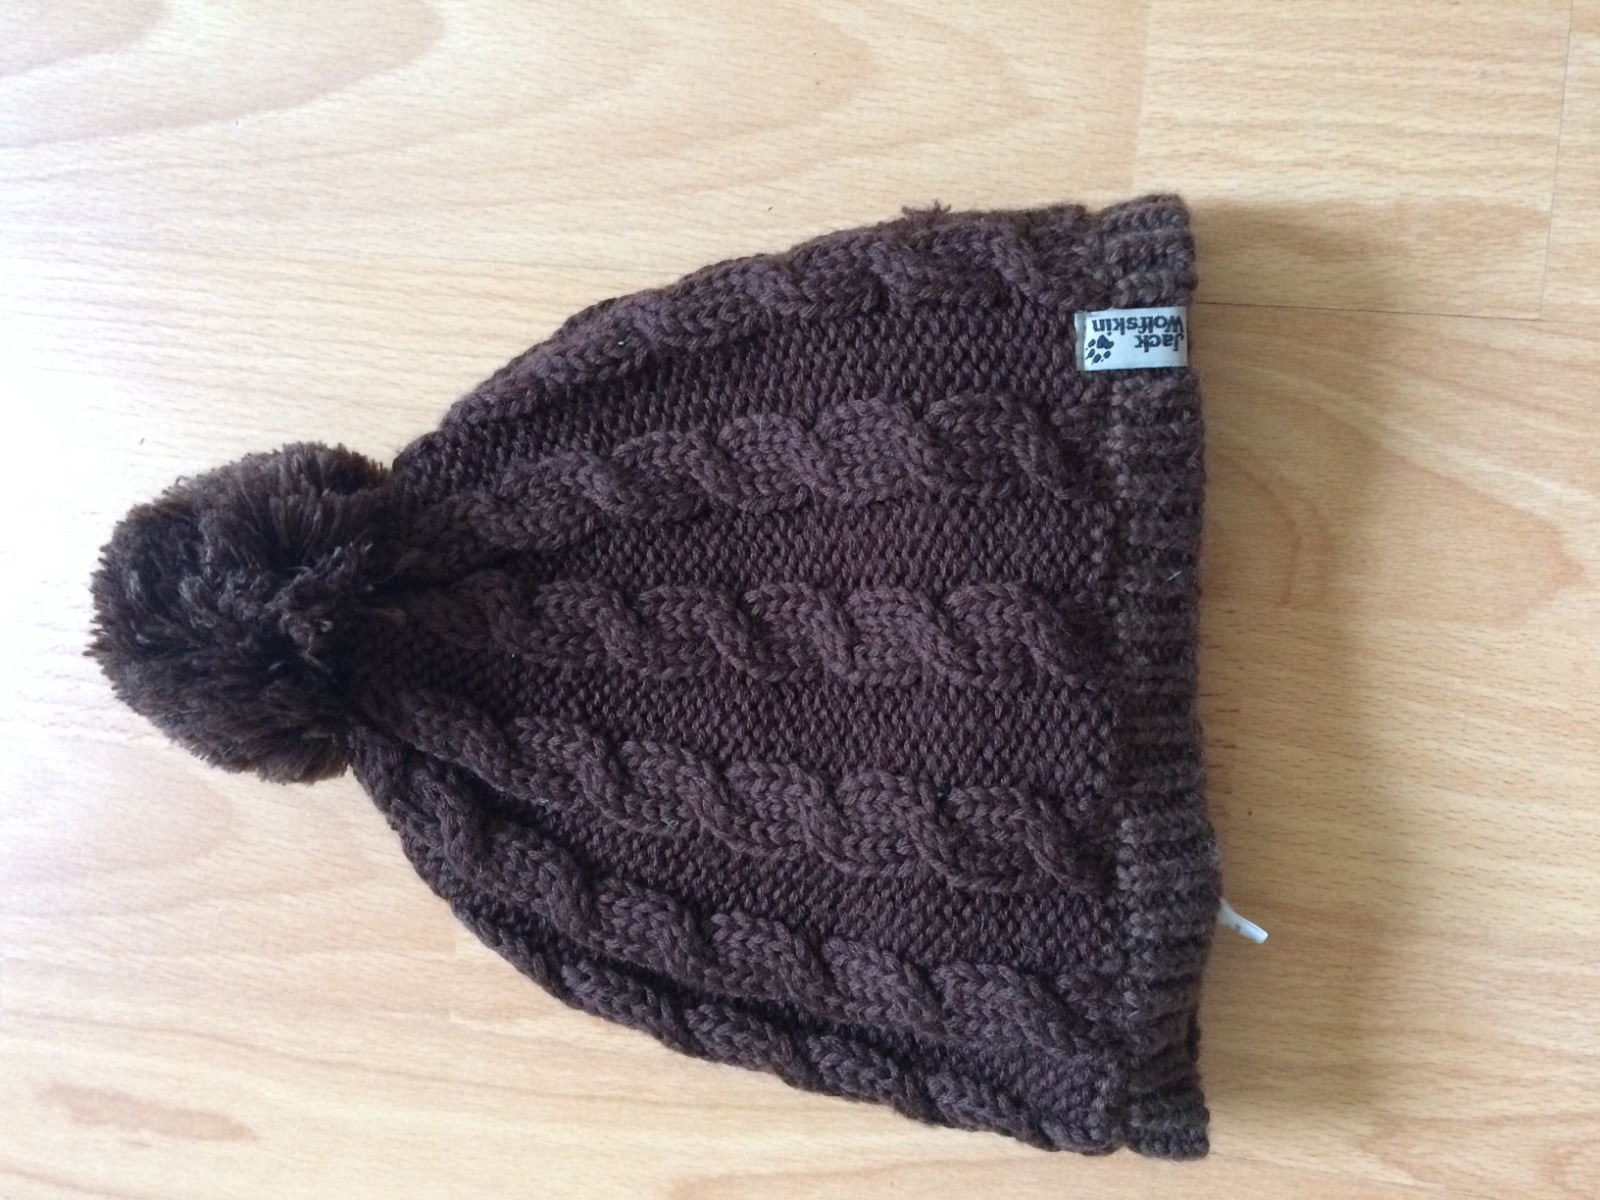 3f5dd6222 Zimná čiapka zn. jack wolfskin, jack wolfskin,m - 10 € od predávajúcej  andy_007 | Detský bazár | ModryKonik.sk